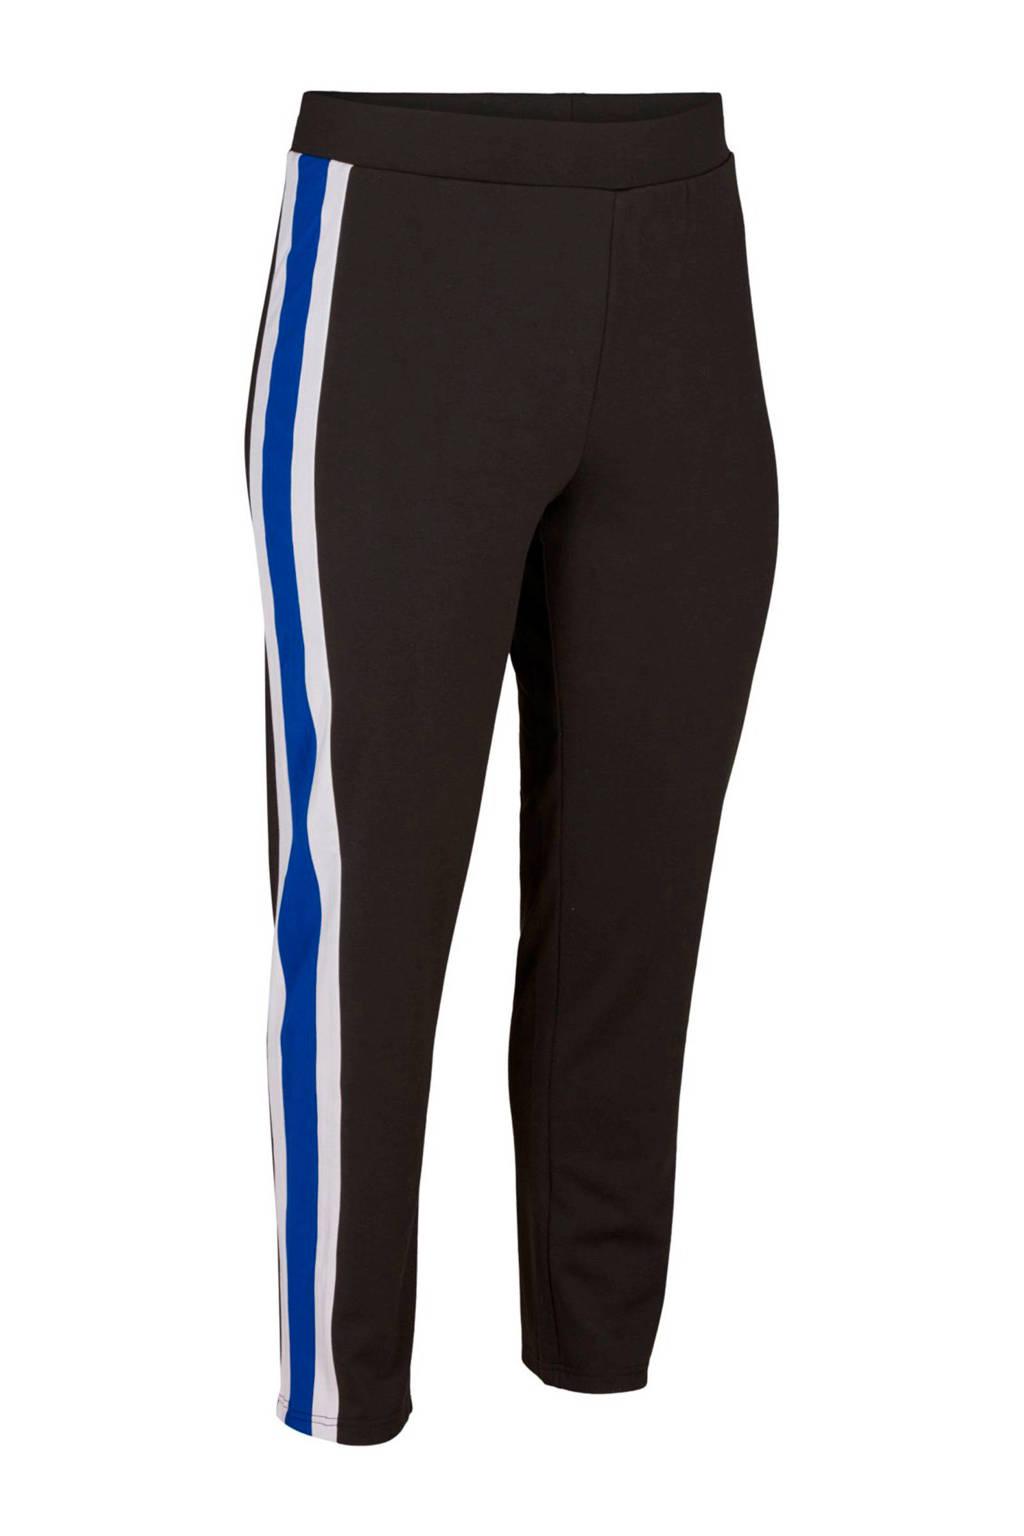 Zizzi legging zwart/blauw/wit, Zwart/blauw/wit